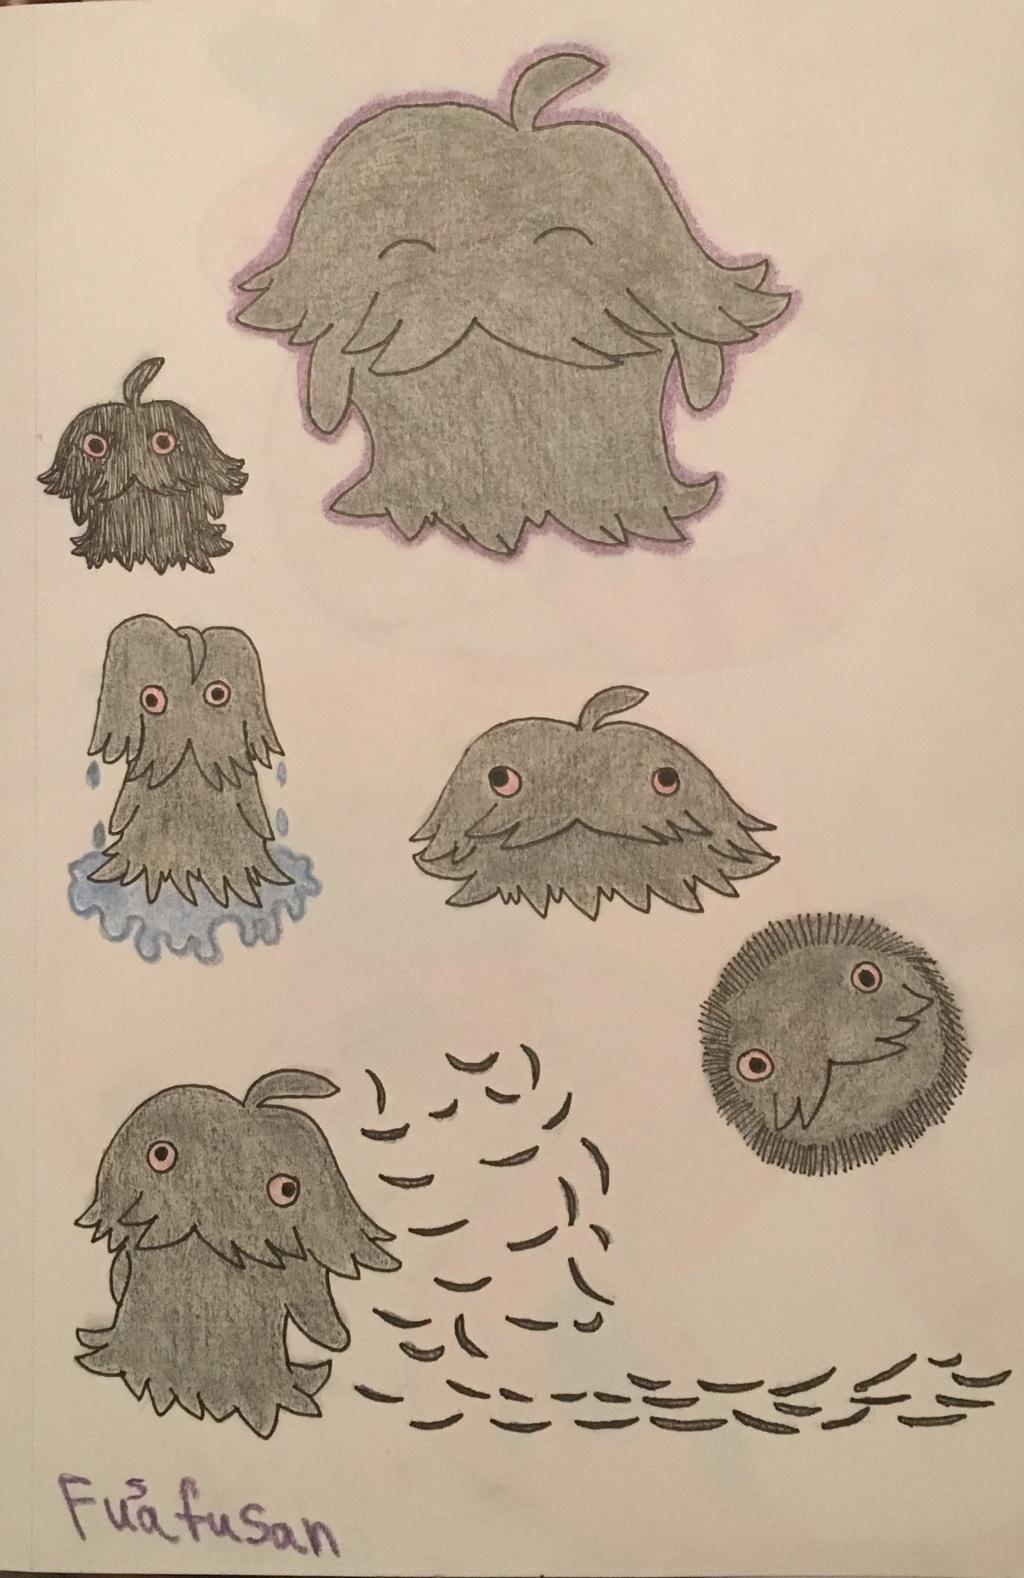 Eerie Tribe Fusafusan